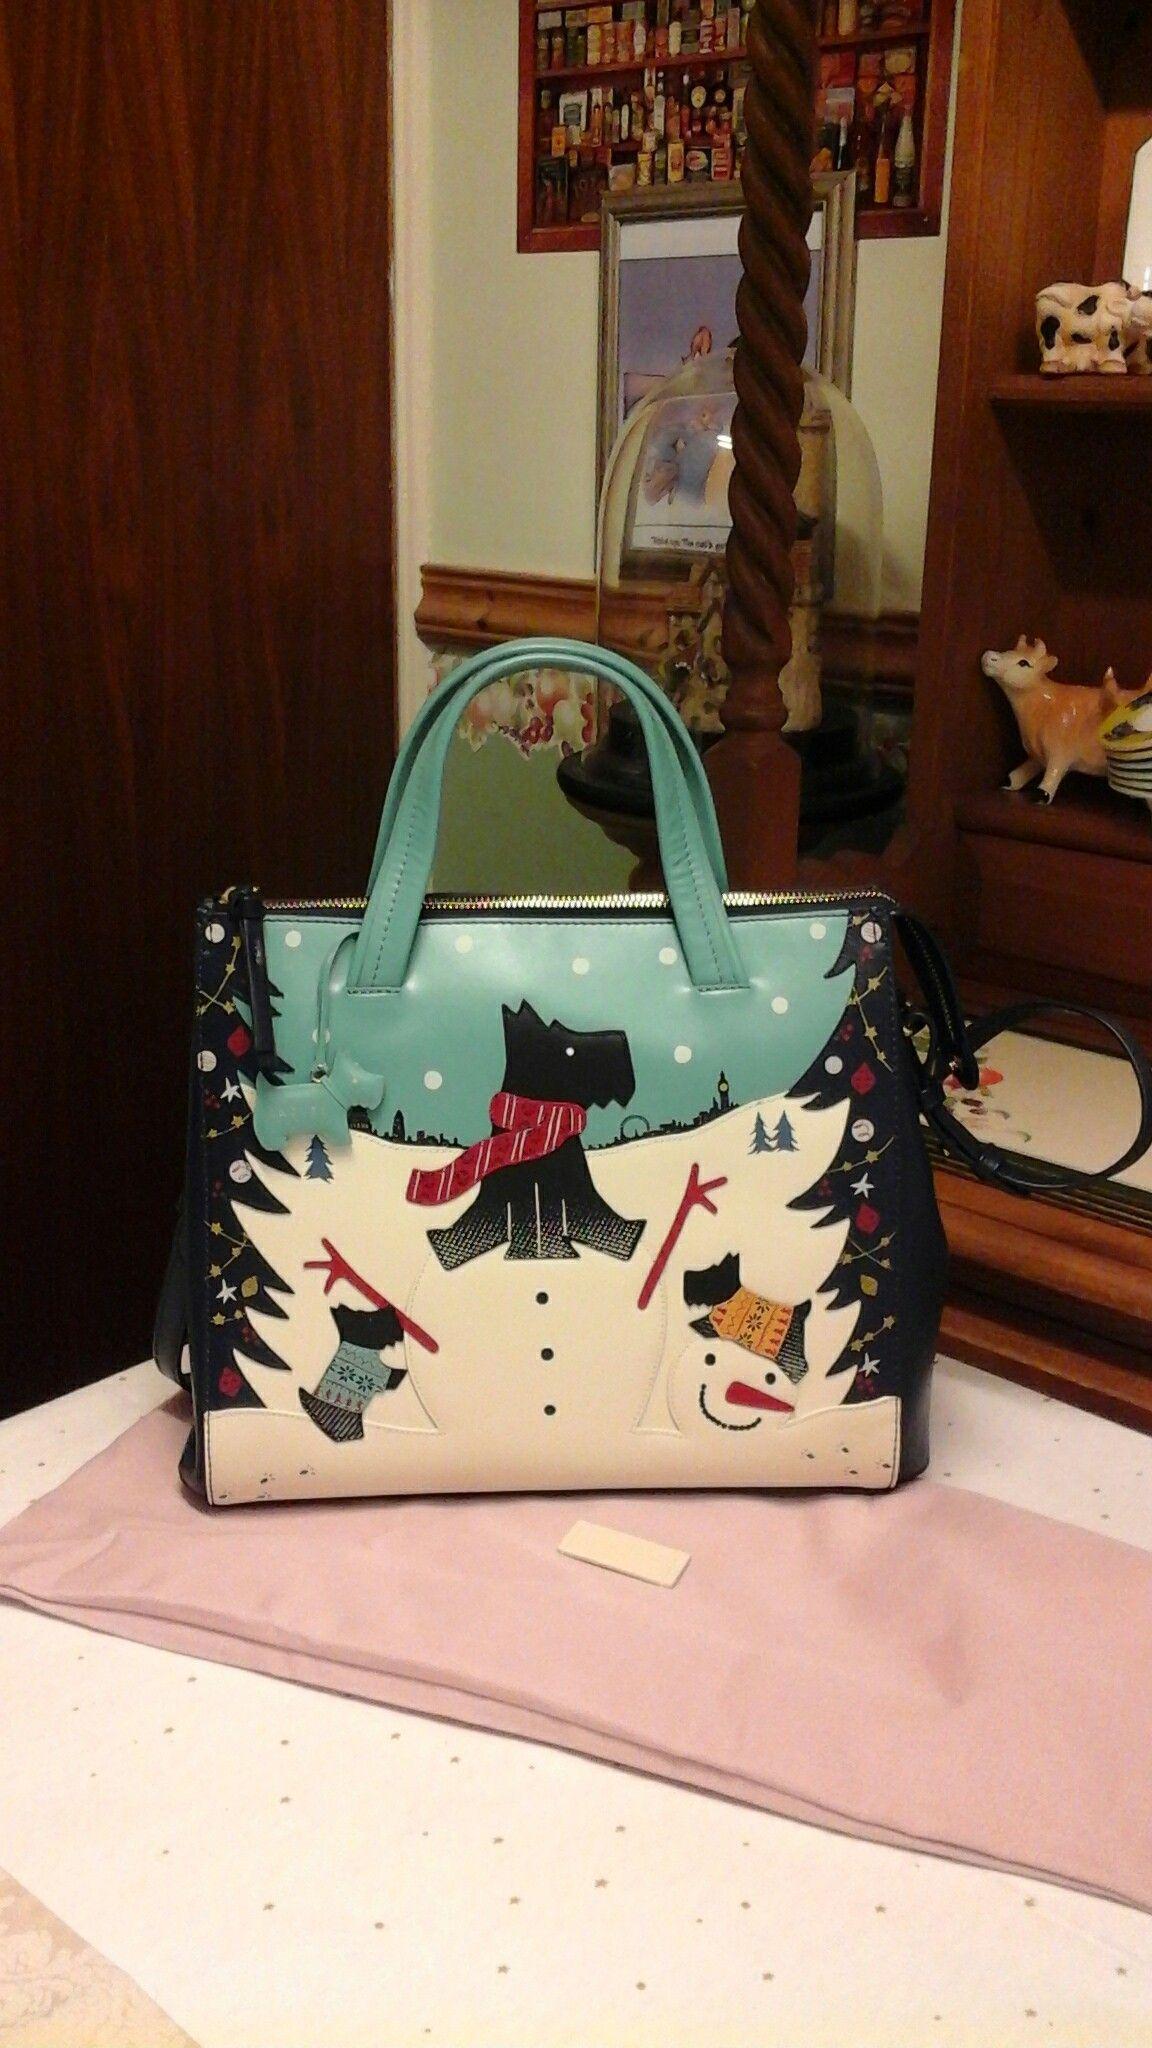 Fun Scottie Dogs In Snow Handbag Probably By Radley Of London